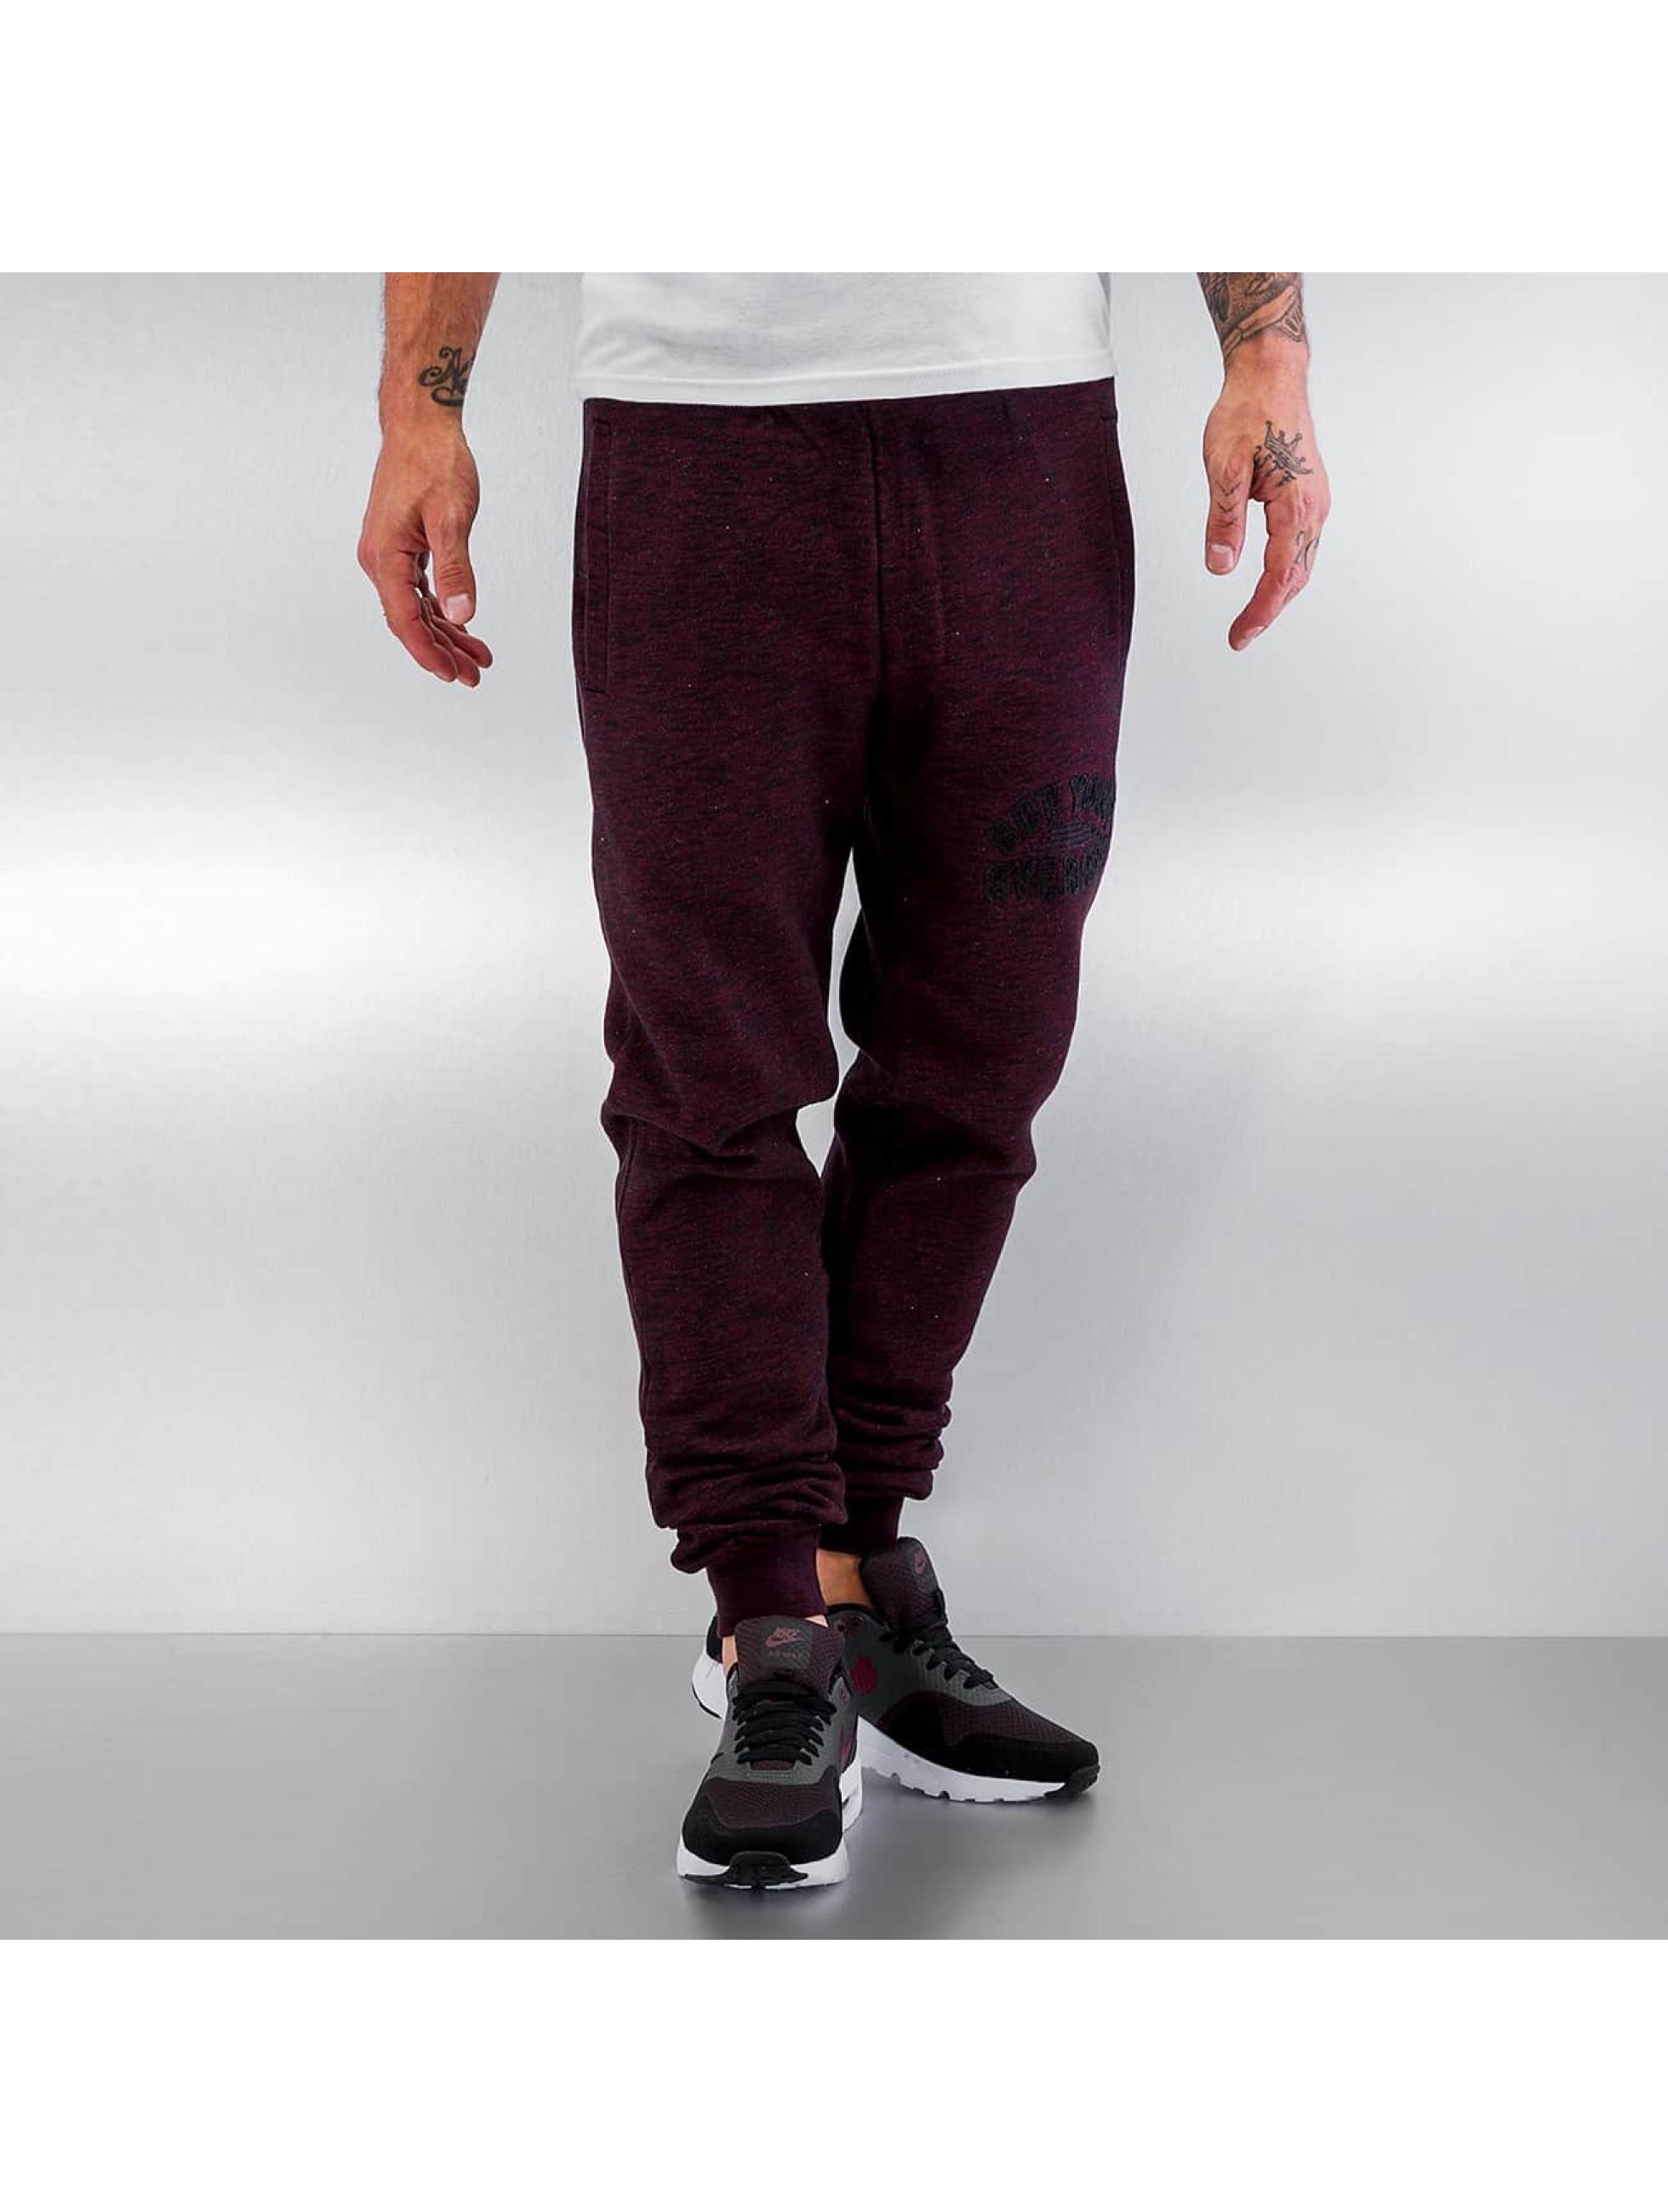 Pelle Pelle Спортивные брюки Not Your Average красный